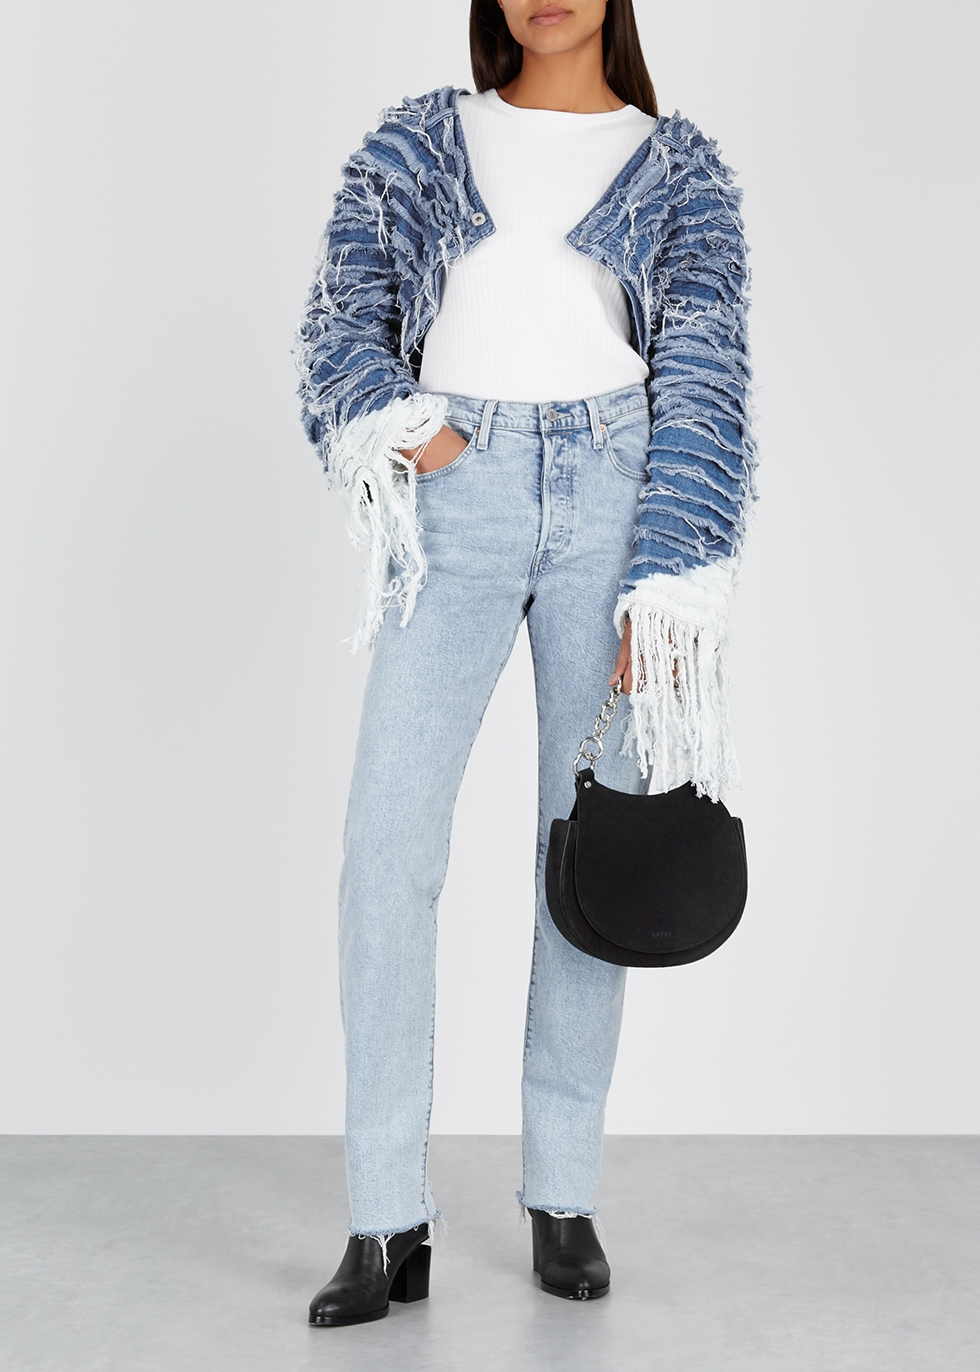 Bolarao light blue distressed denim jacket - Levi's Made & Crafted